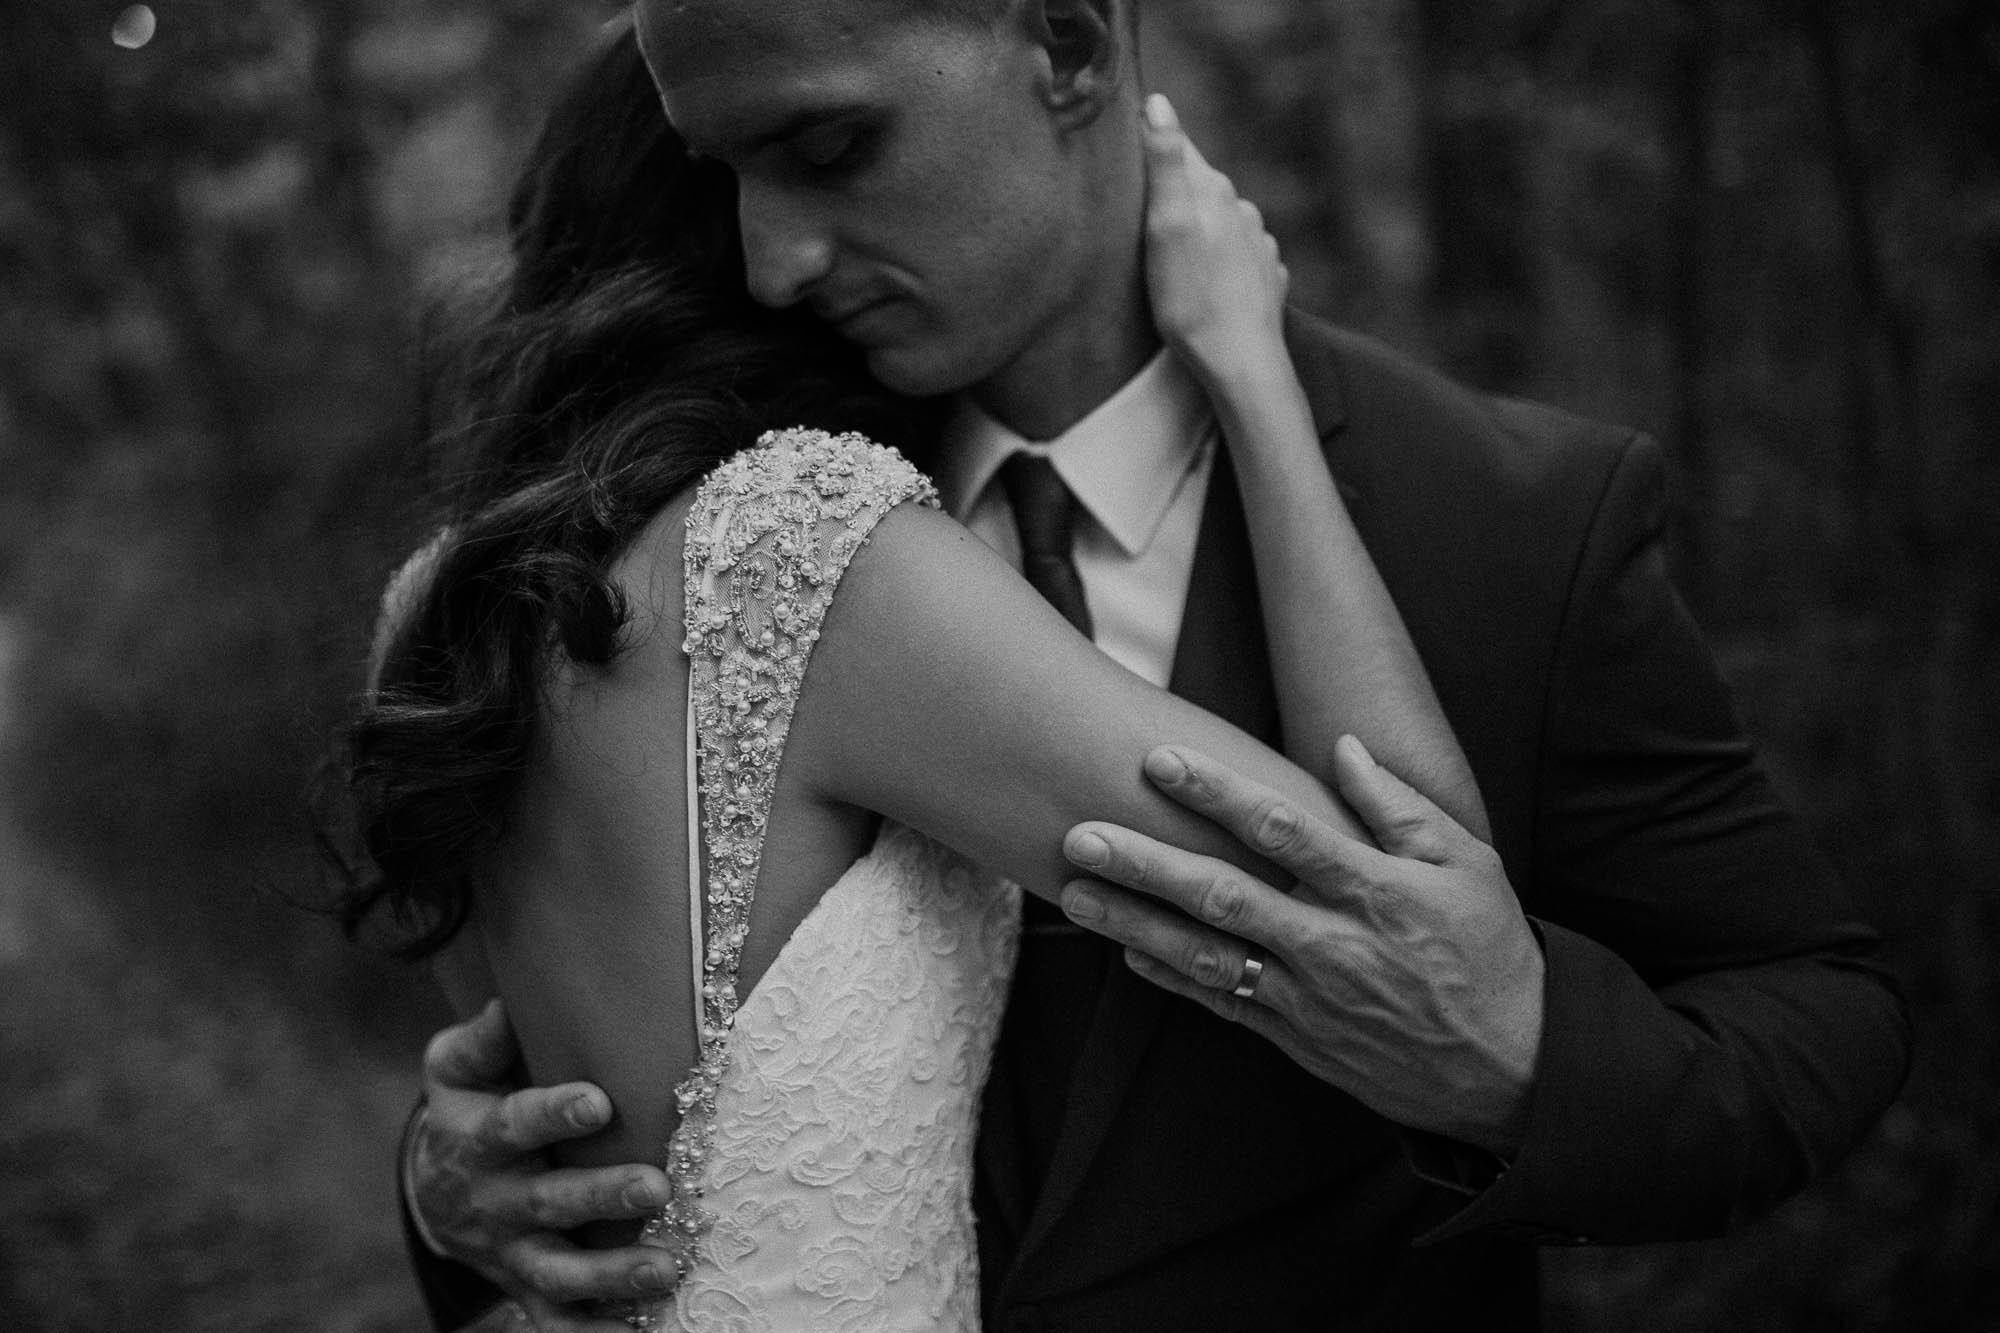 champaign_il_wedding_photography-0837.jpg